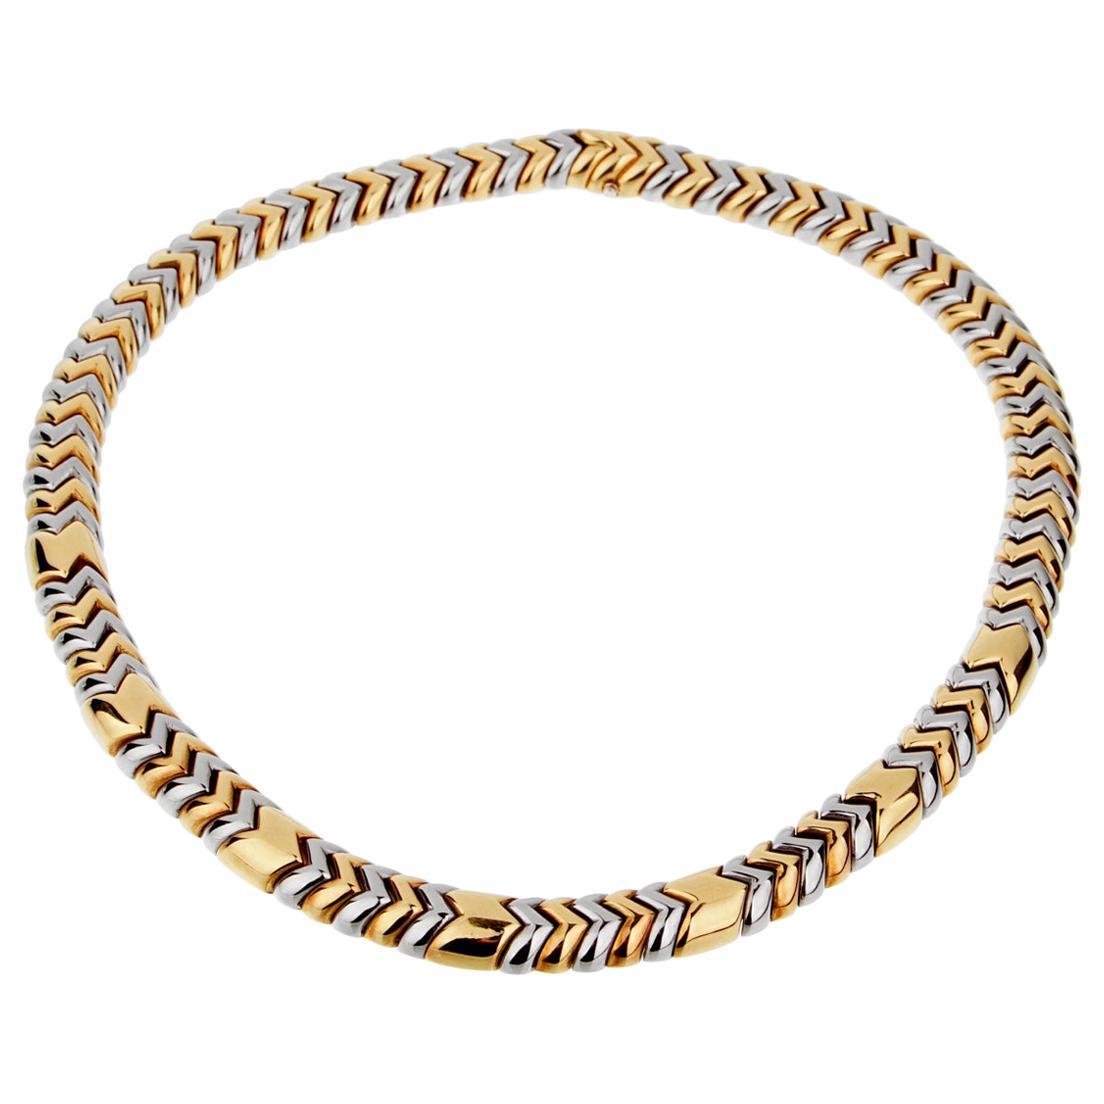 Bulgari Spiga Yellow Gold Choker Necklace